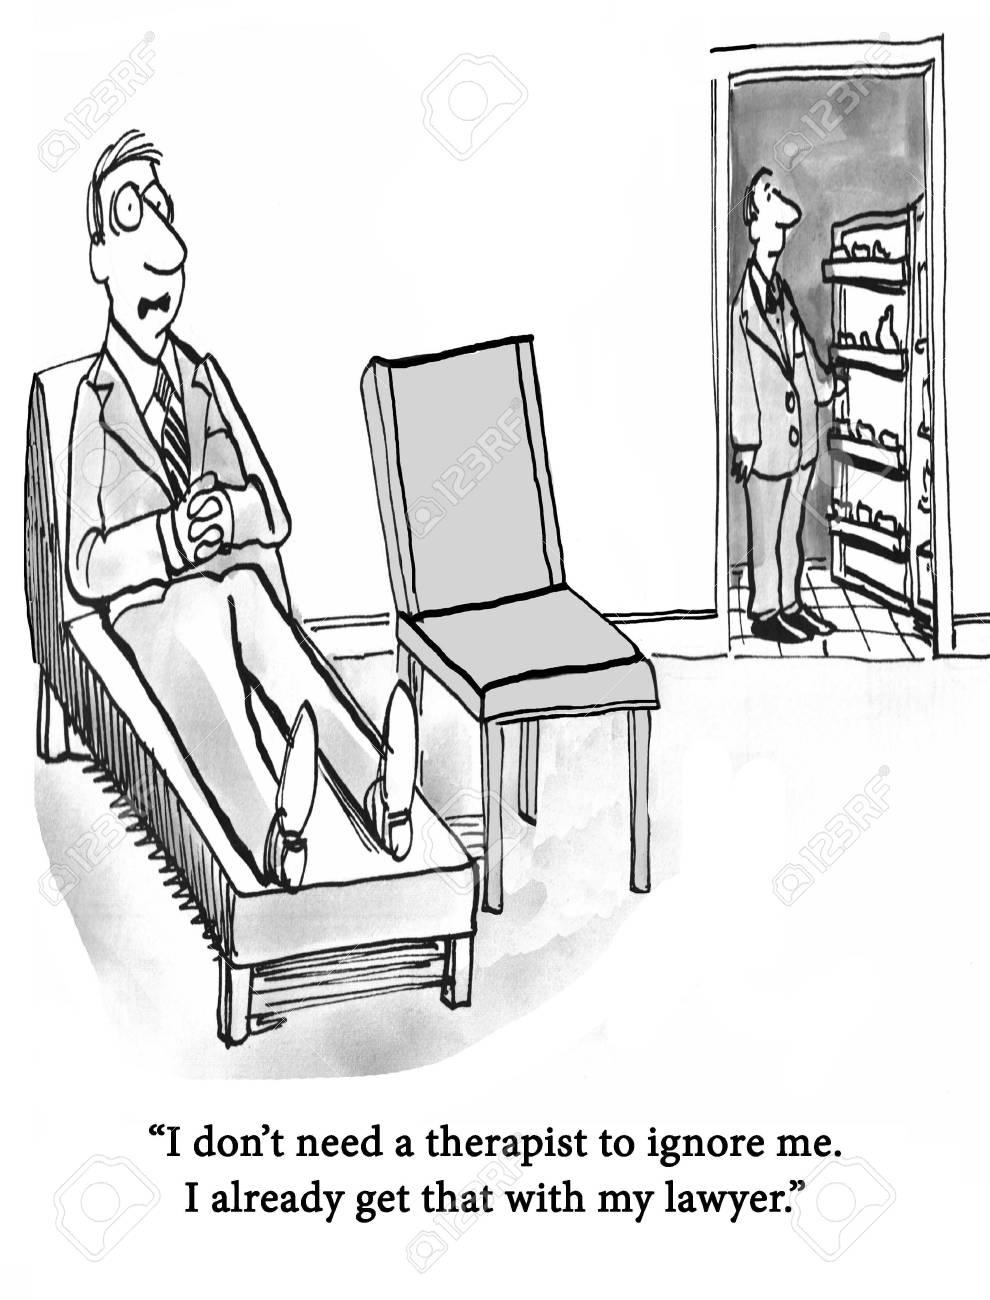 A patient complains about the therapist ignoring him